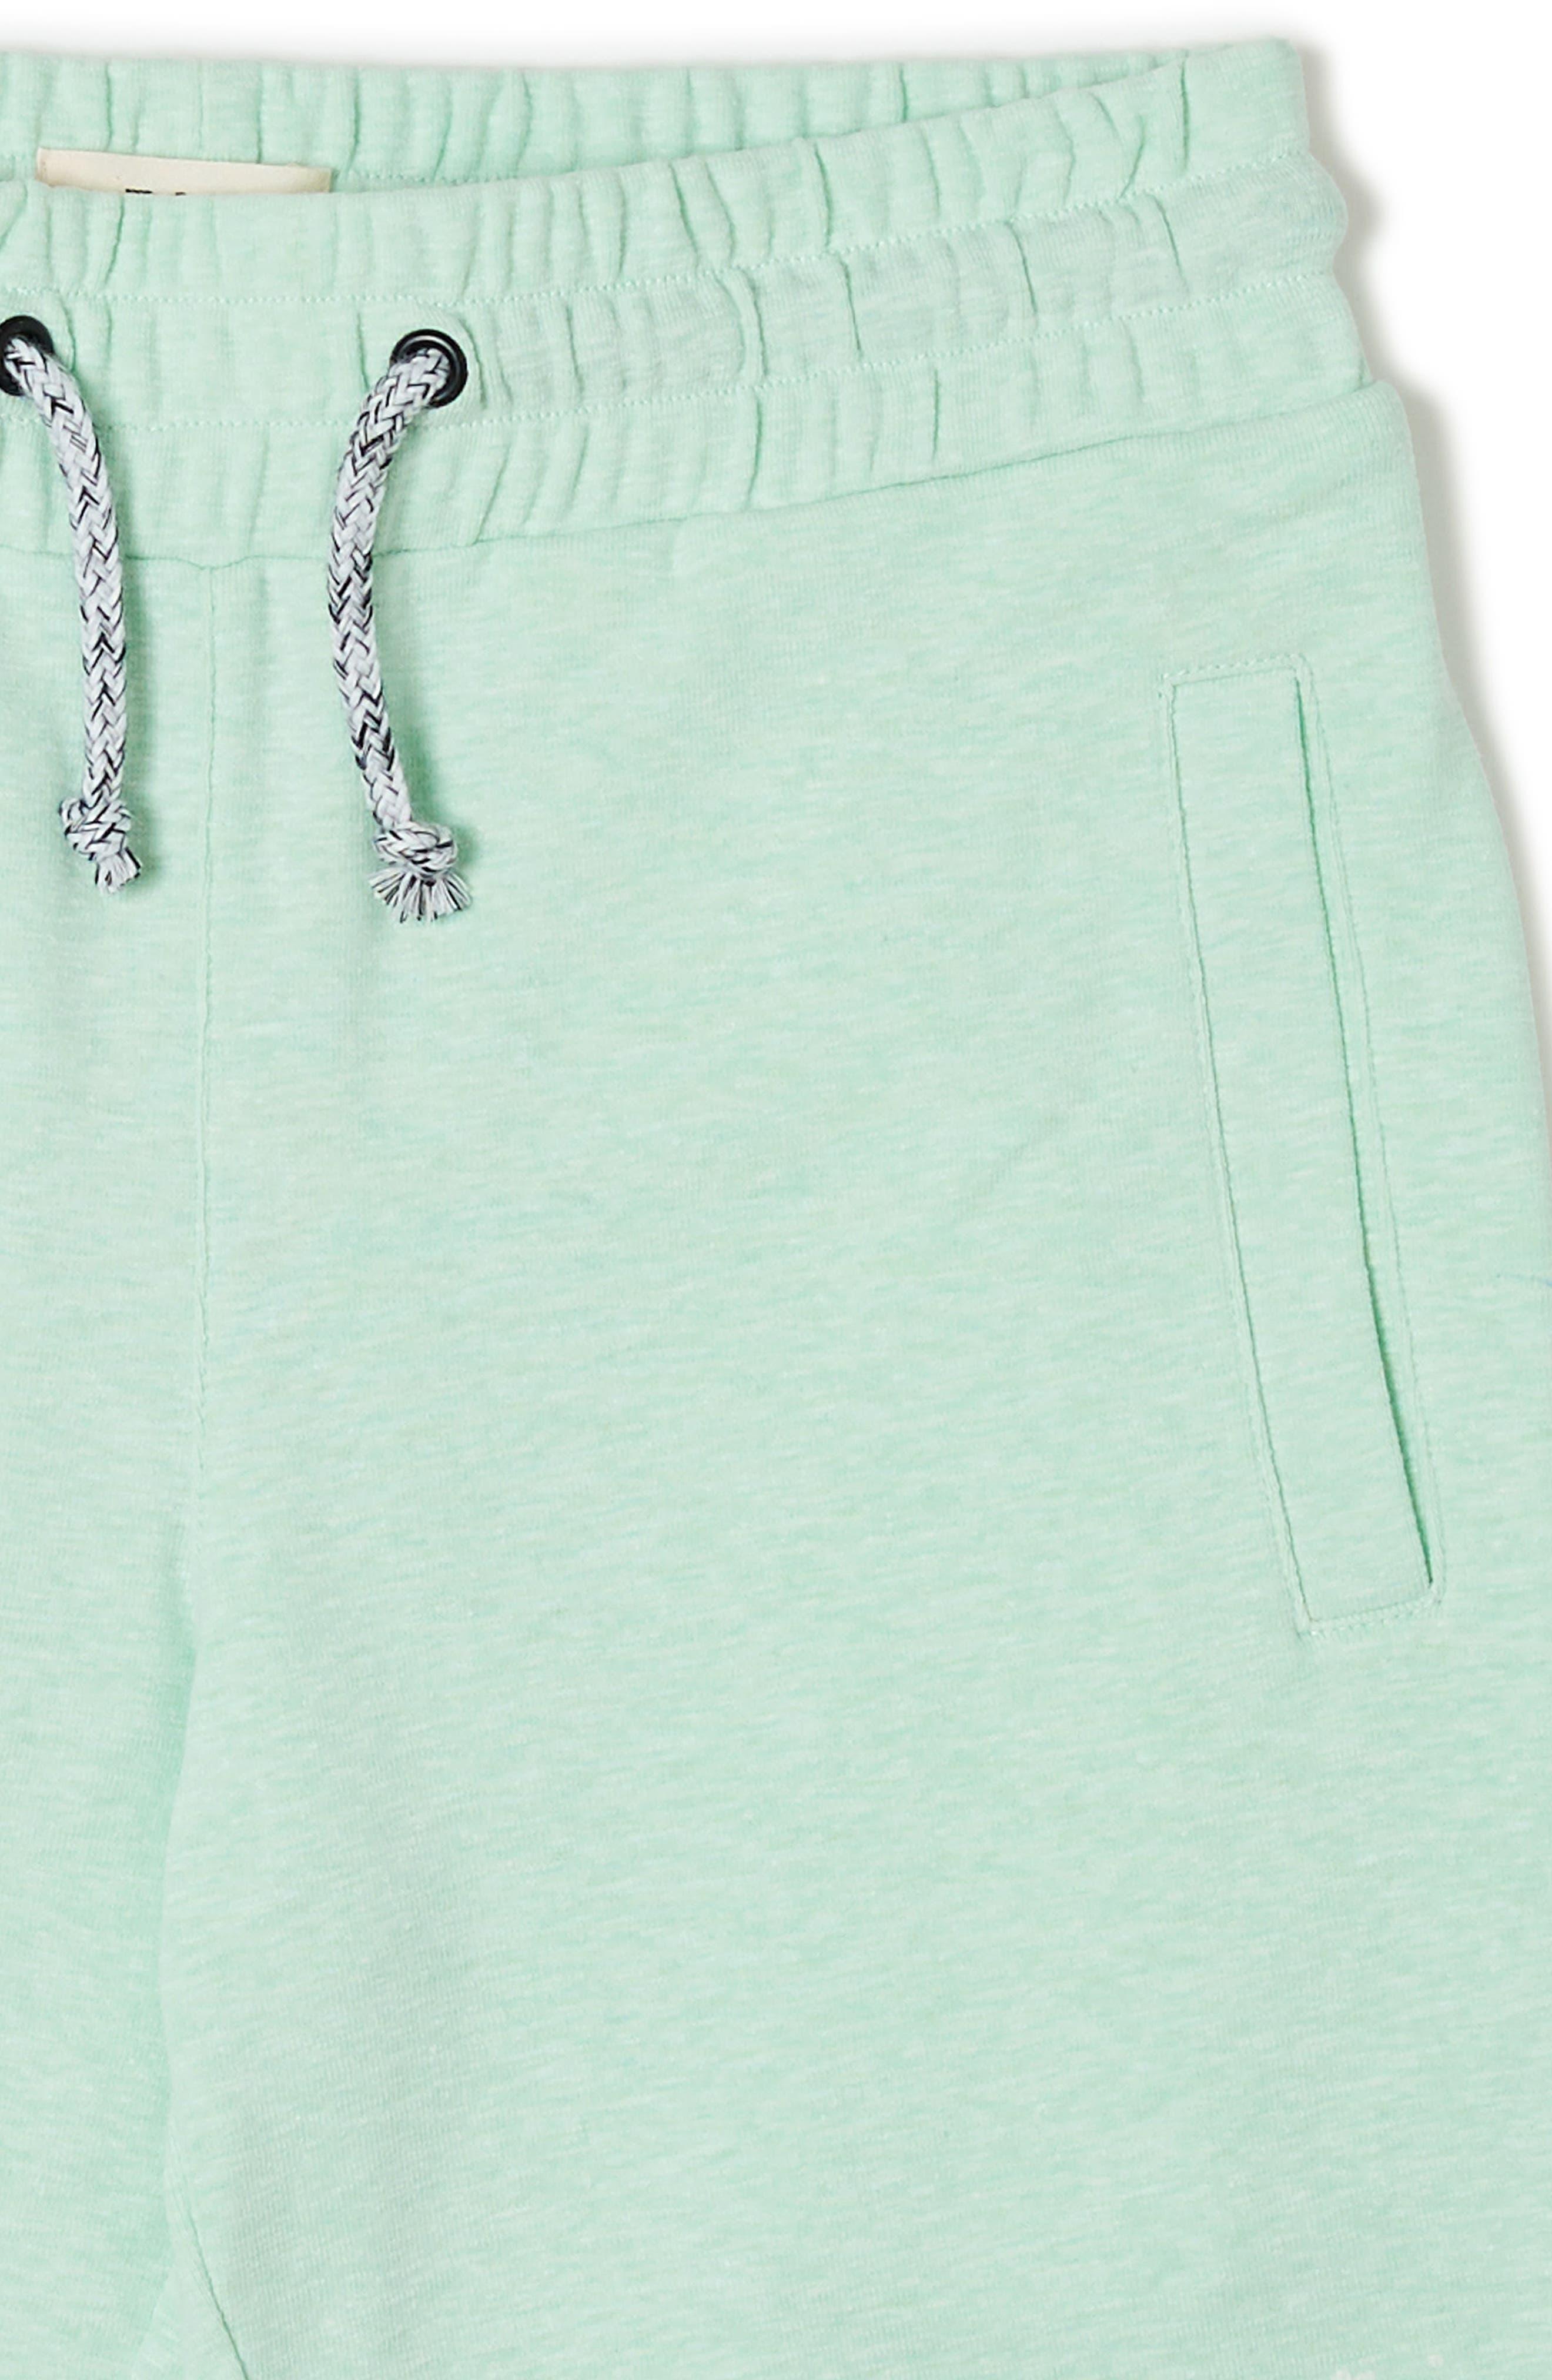 Ranger Knit Shorts,                             Alternate thumbnail 3, color,                             GREEN